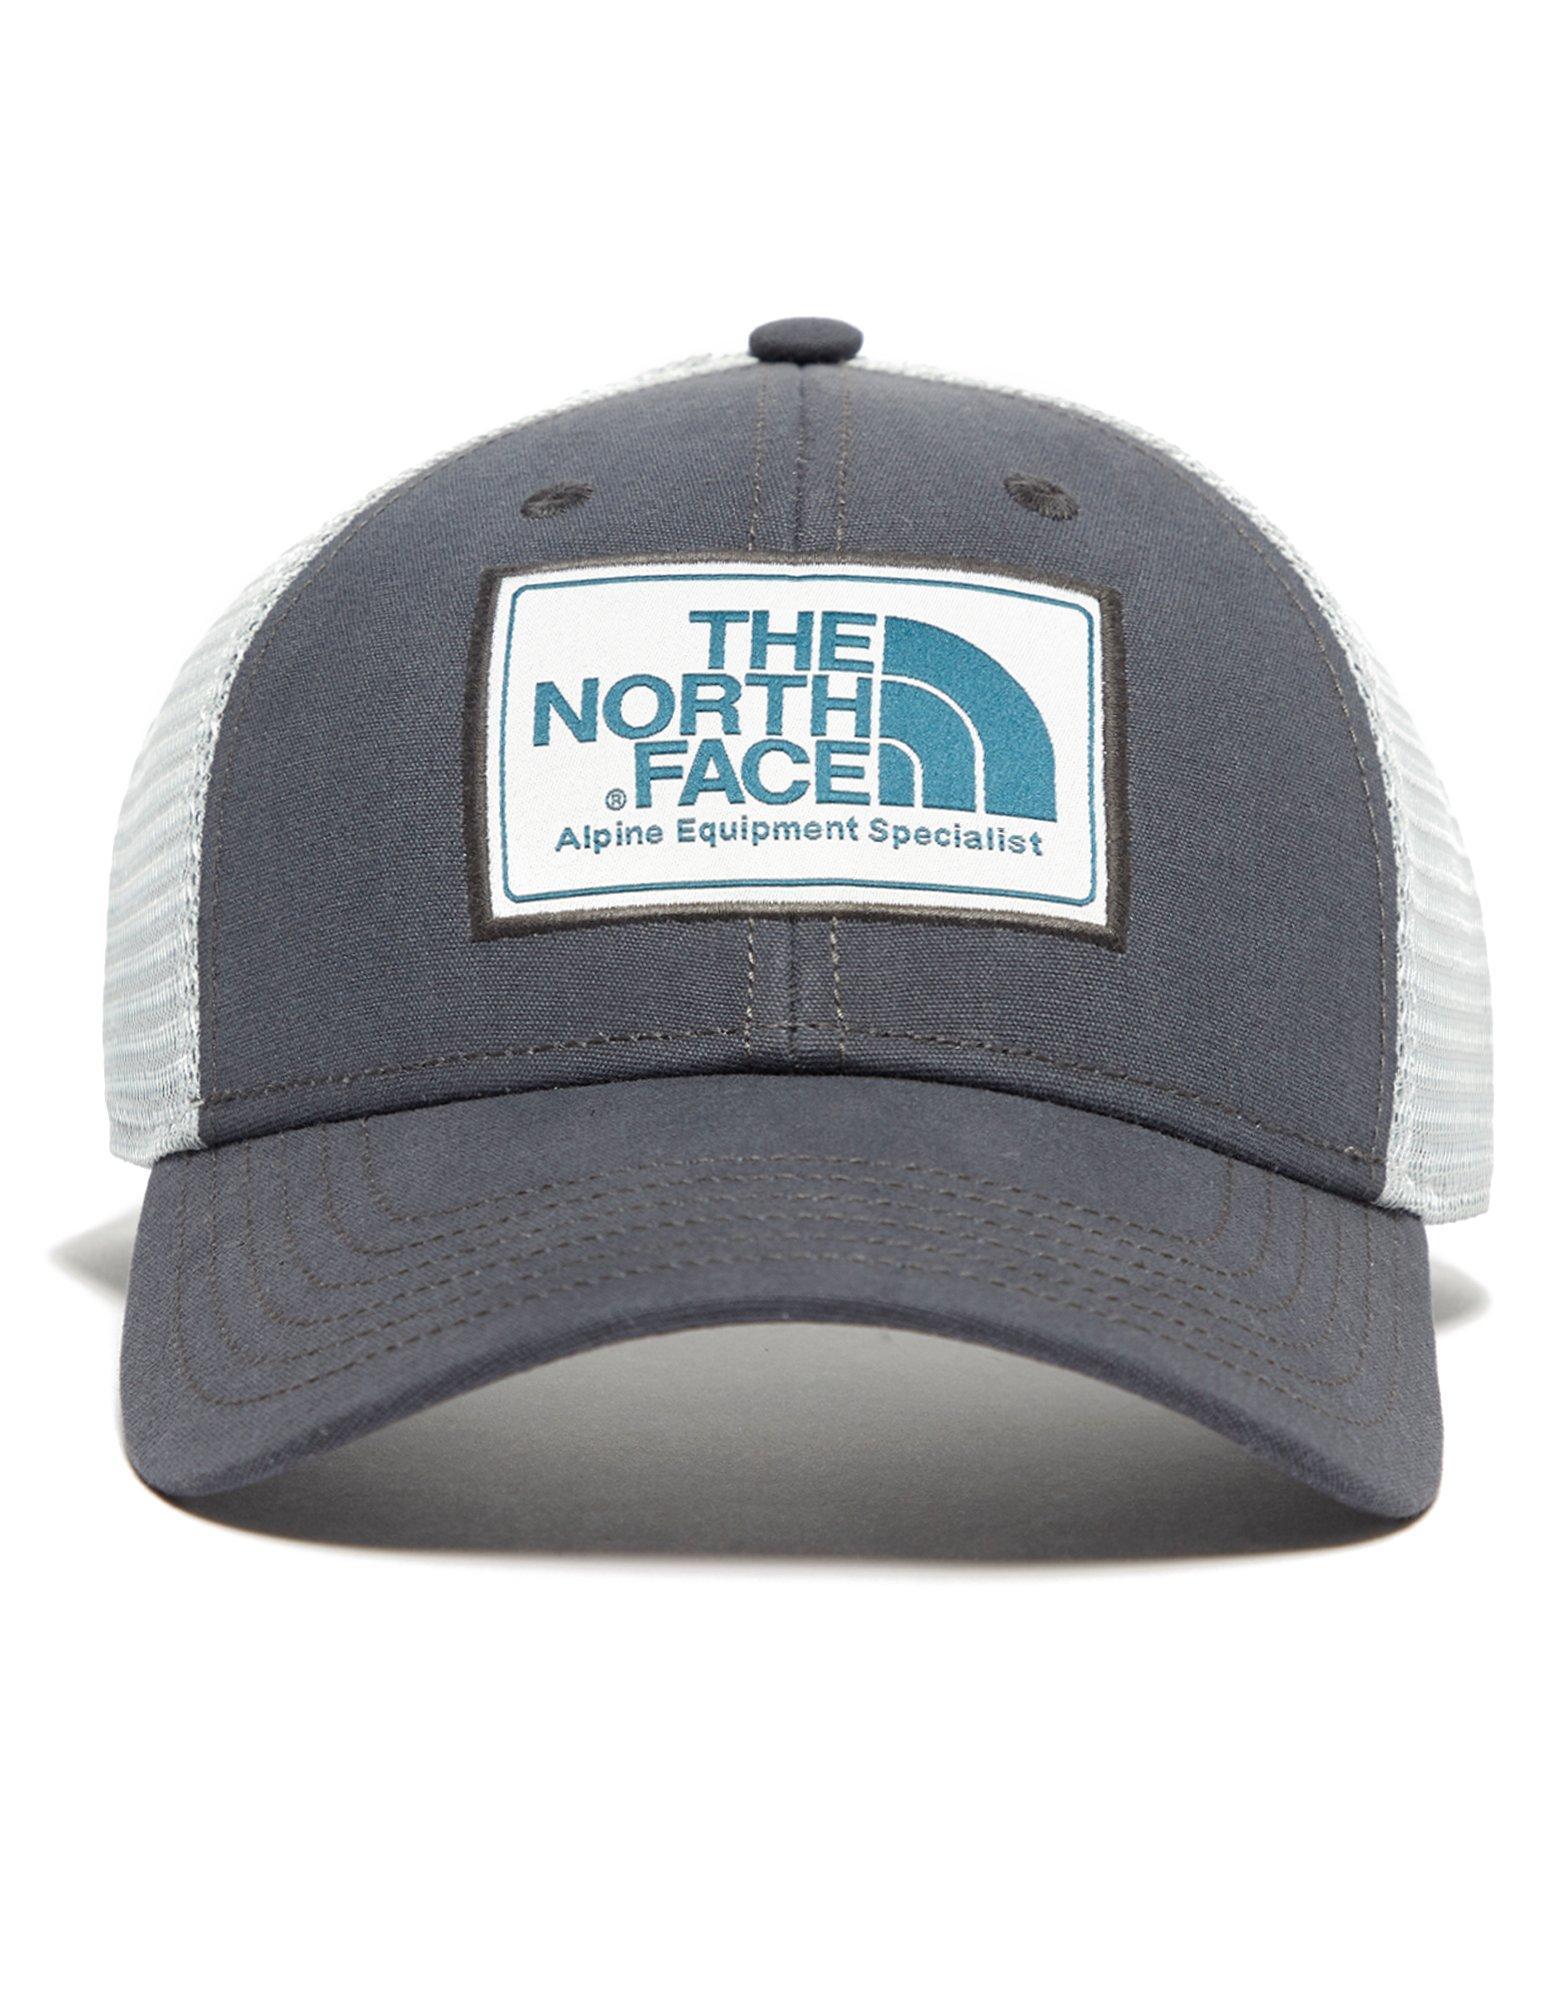 5a8133fca4d2e9 The North Face Mudder Trucker Cap in Gray - Lyst